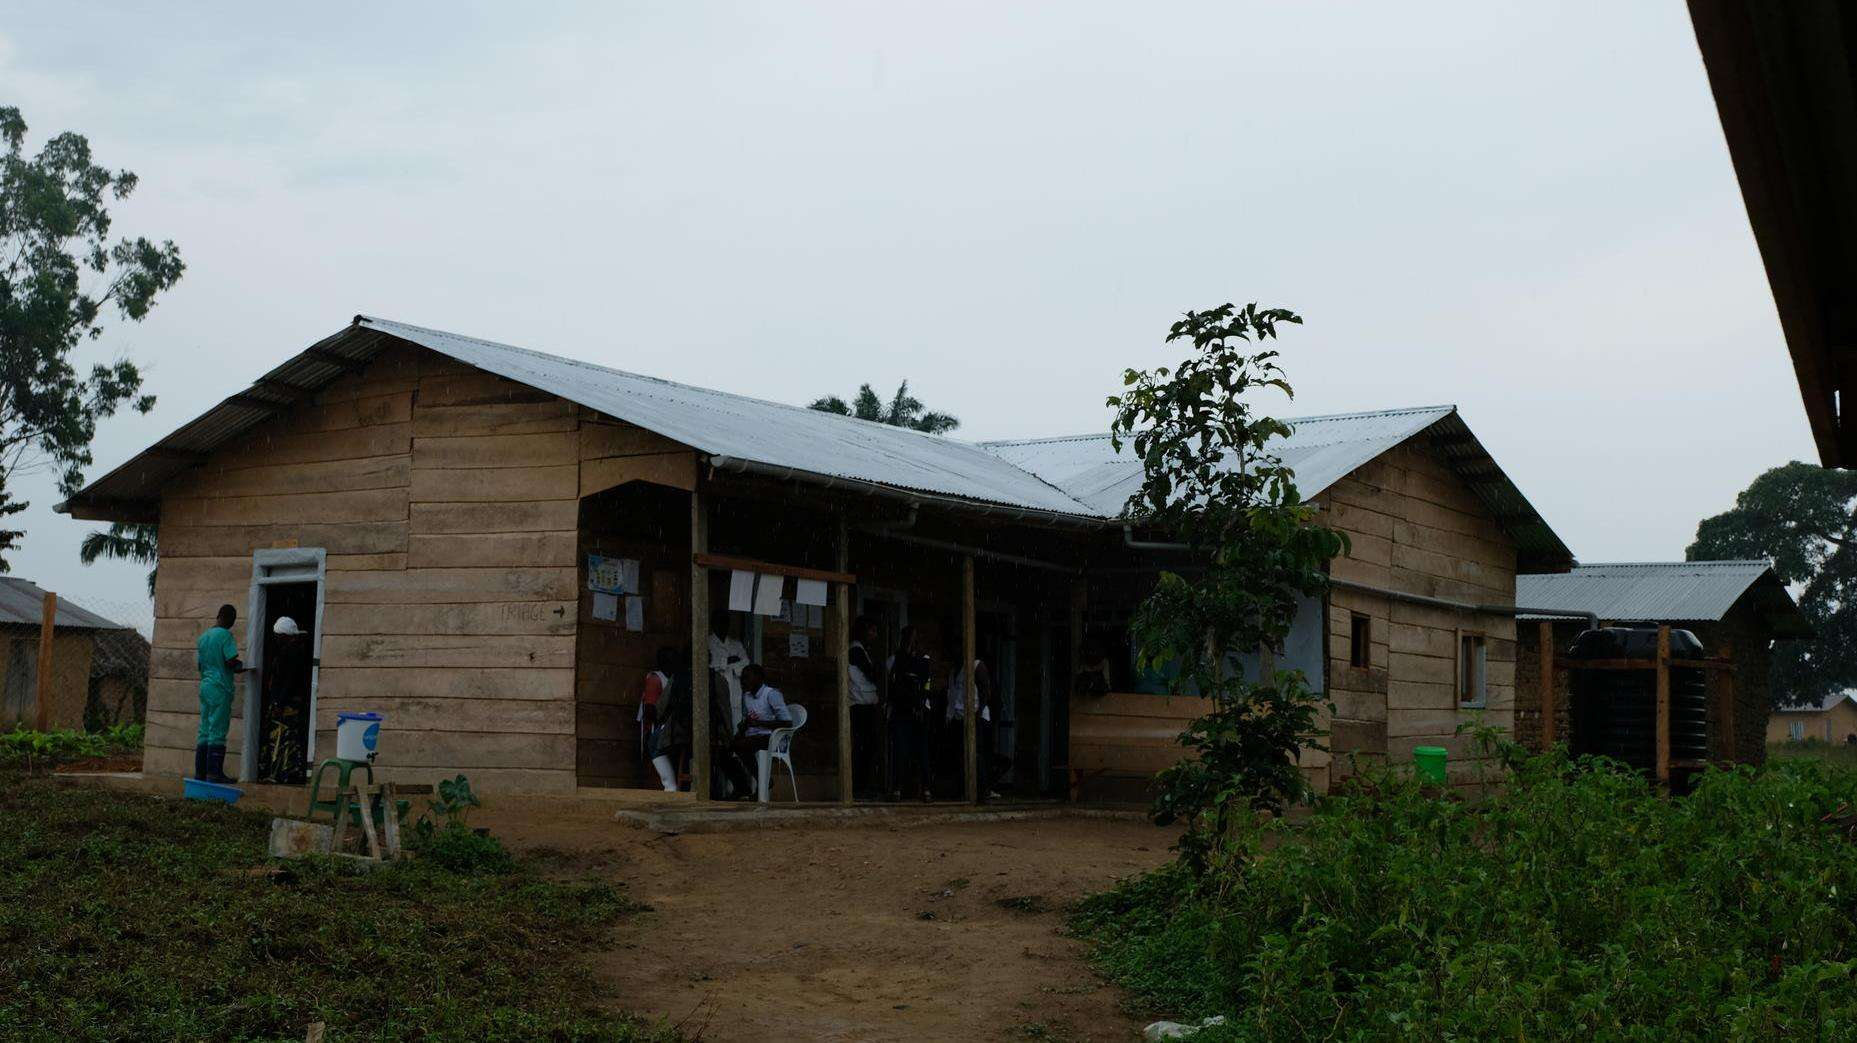 Ebola outbreak threatens fragile local health system in eastern Democratic Republic of Congo